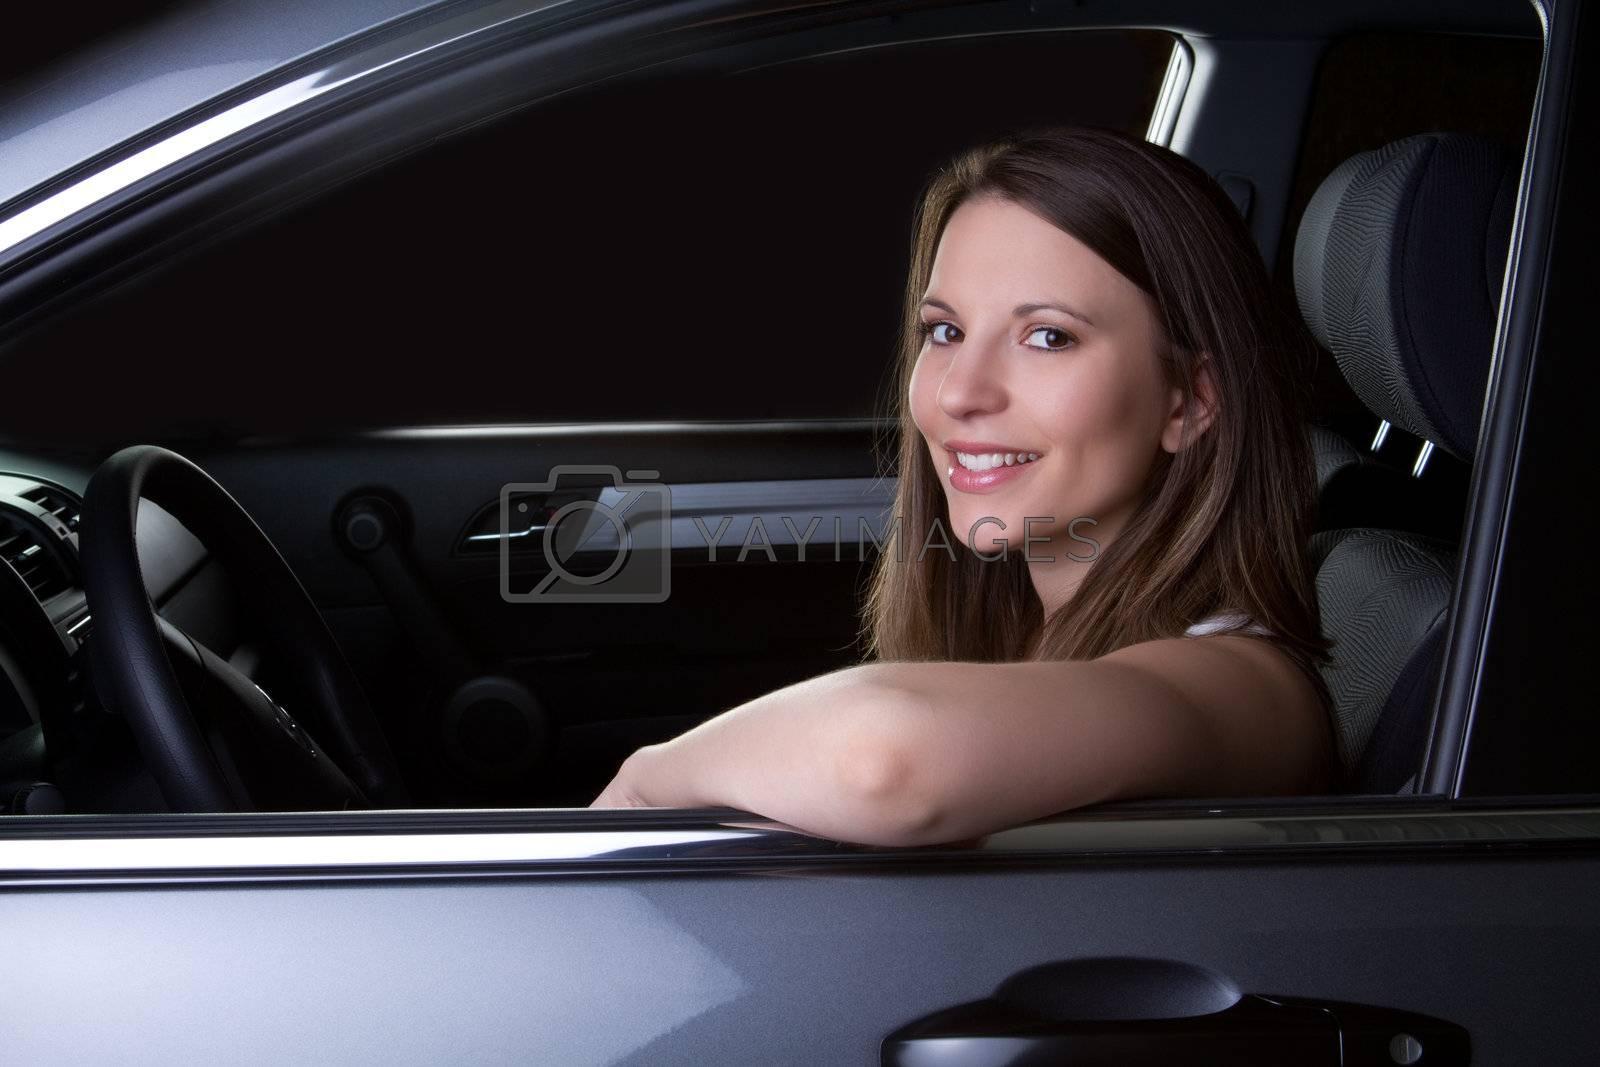 Teen girl sitting in car